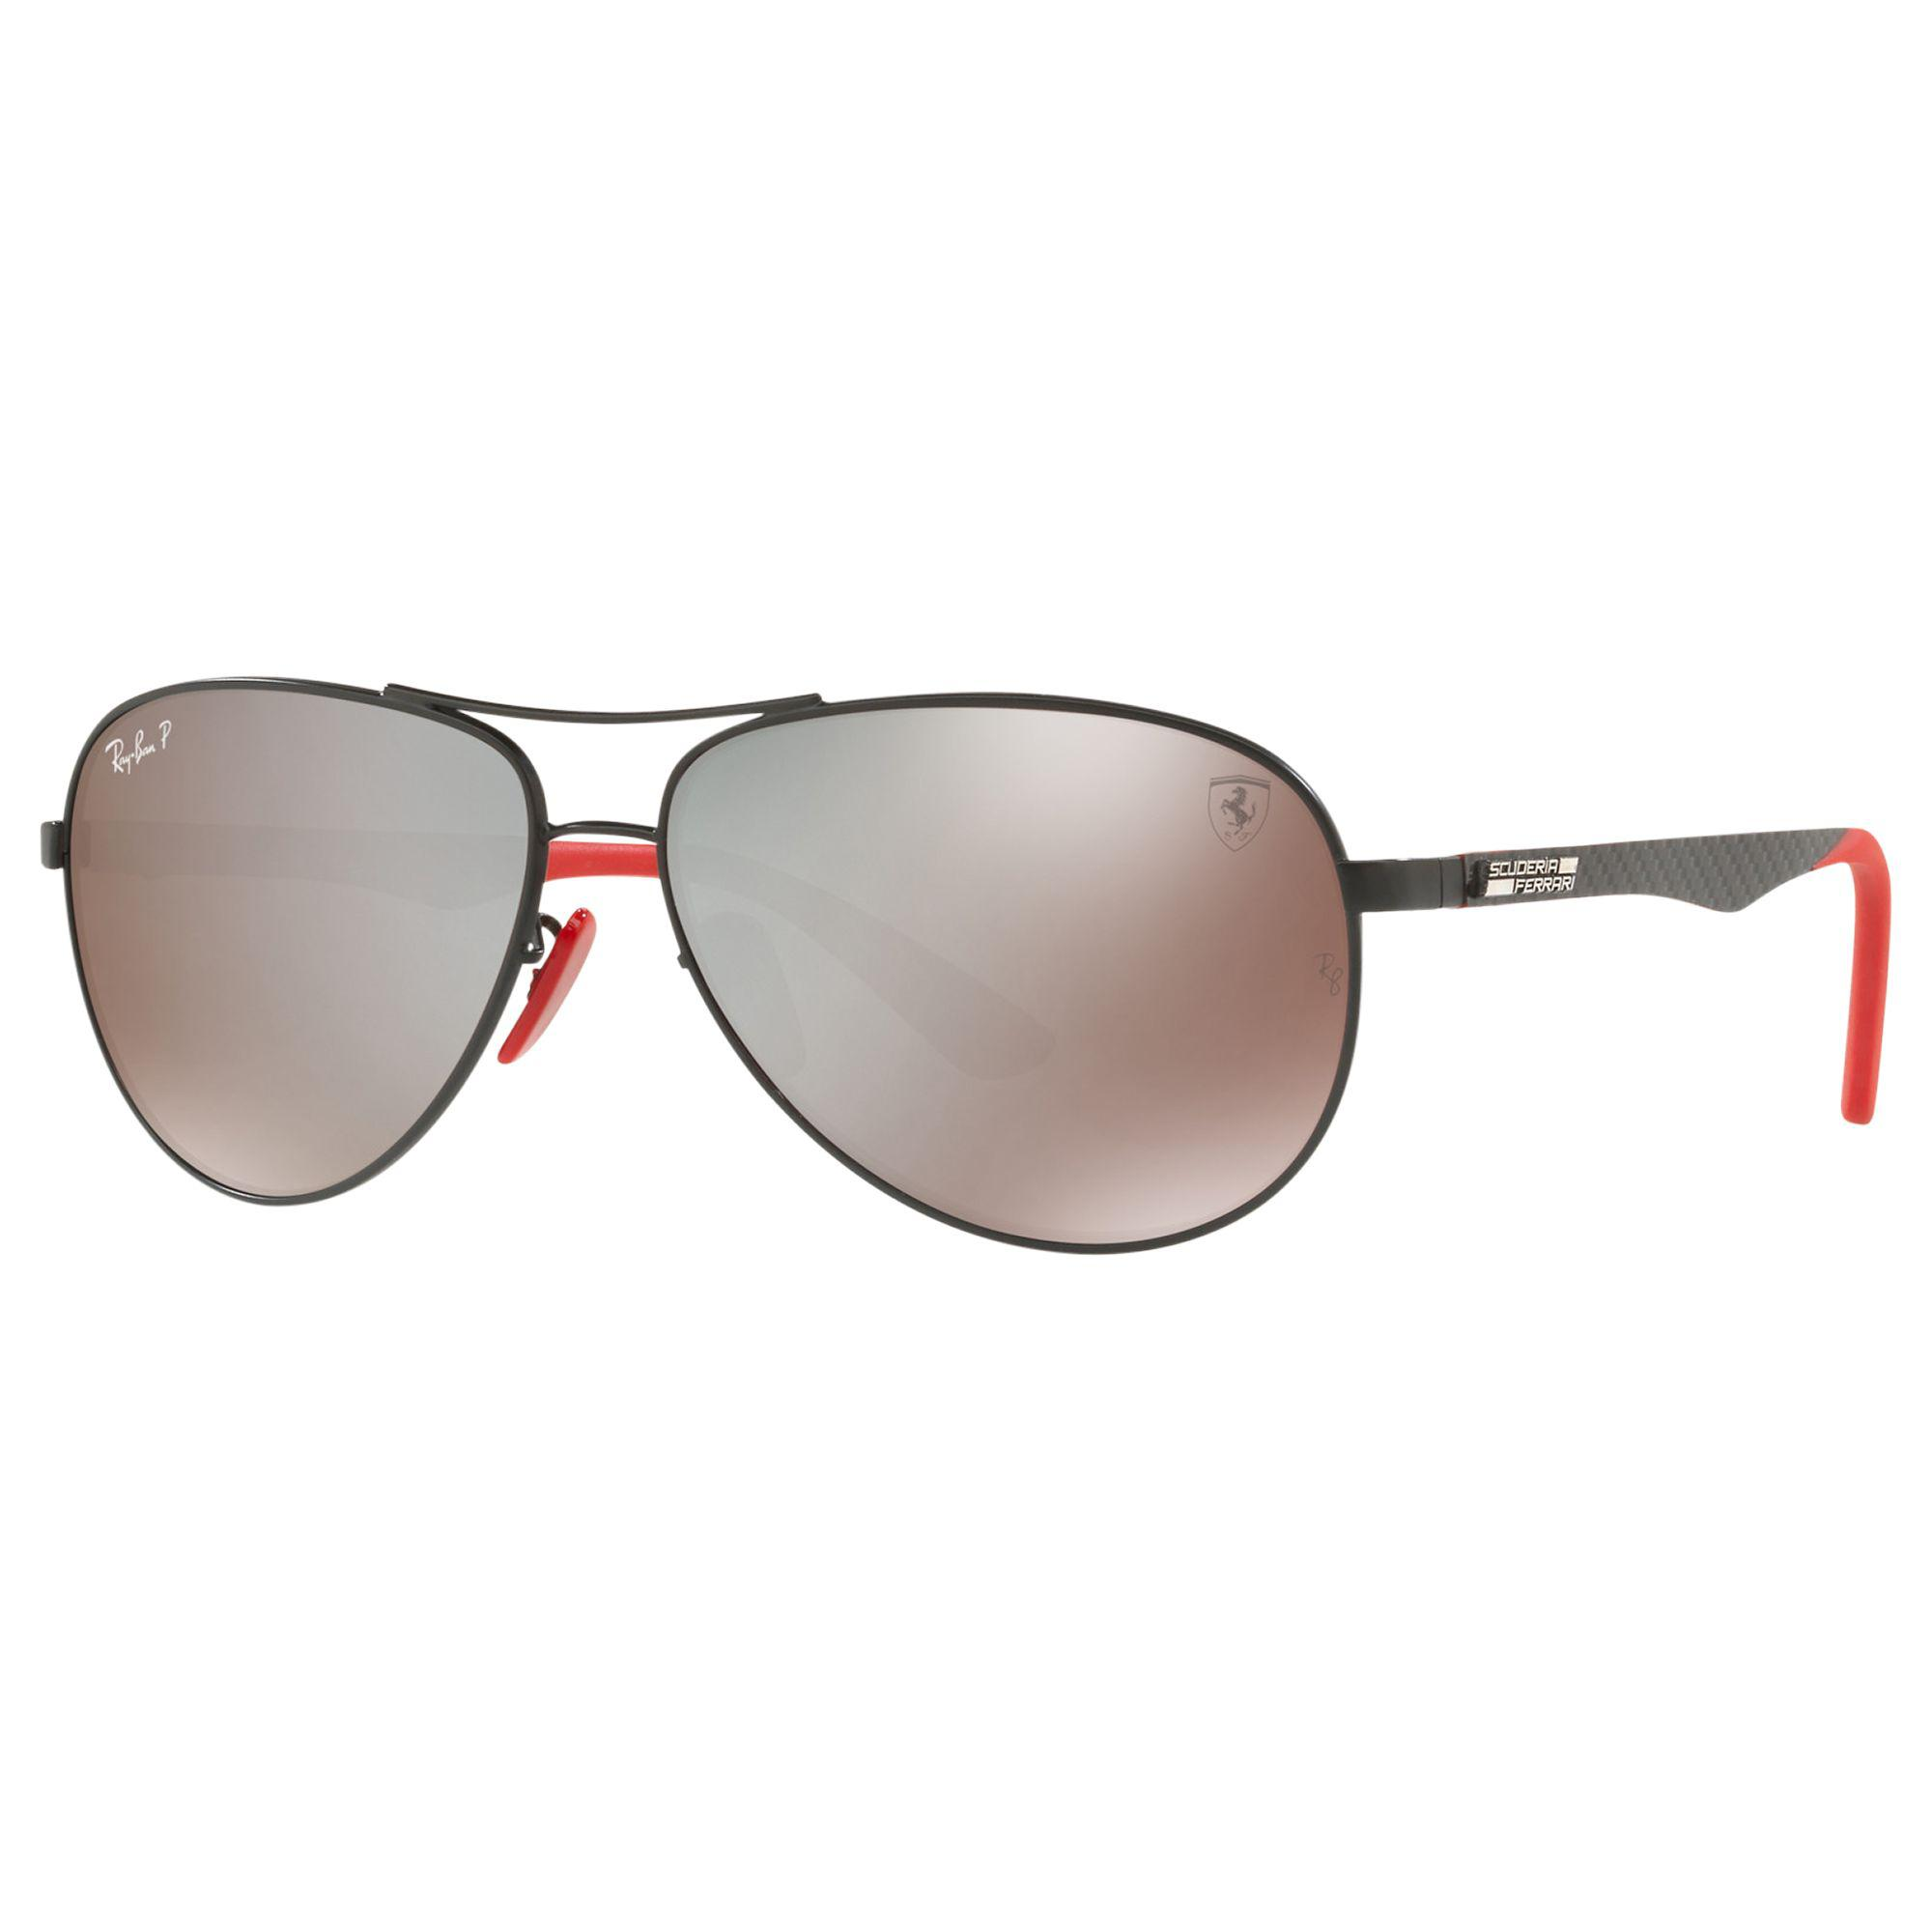 9c129f5ff49 Ray-Ban Rb8313m Polarised Scuderia Ferrari Aviator Sunglasses in ...